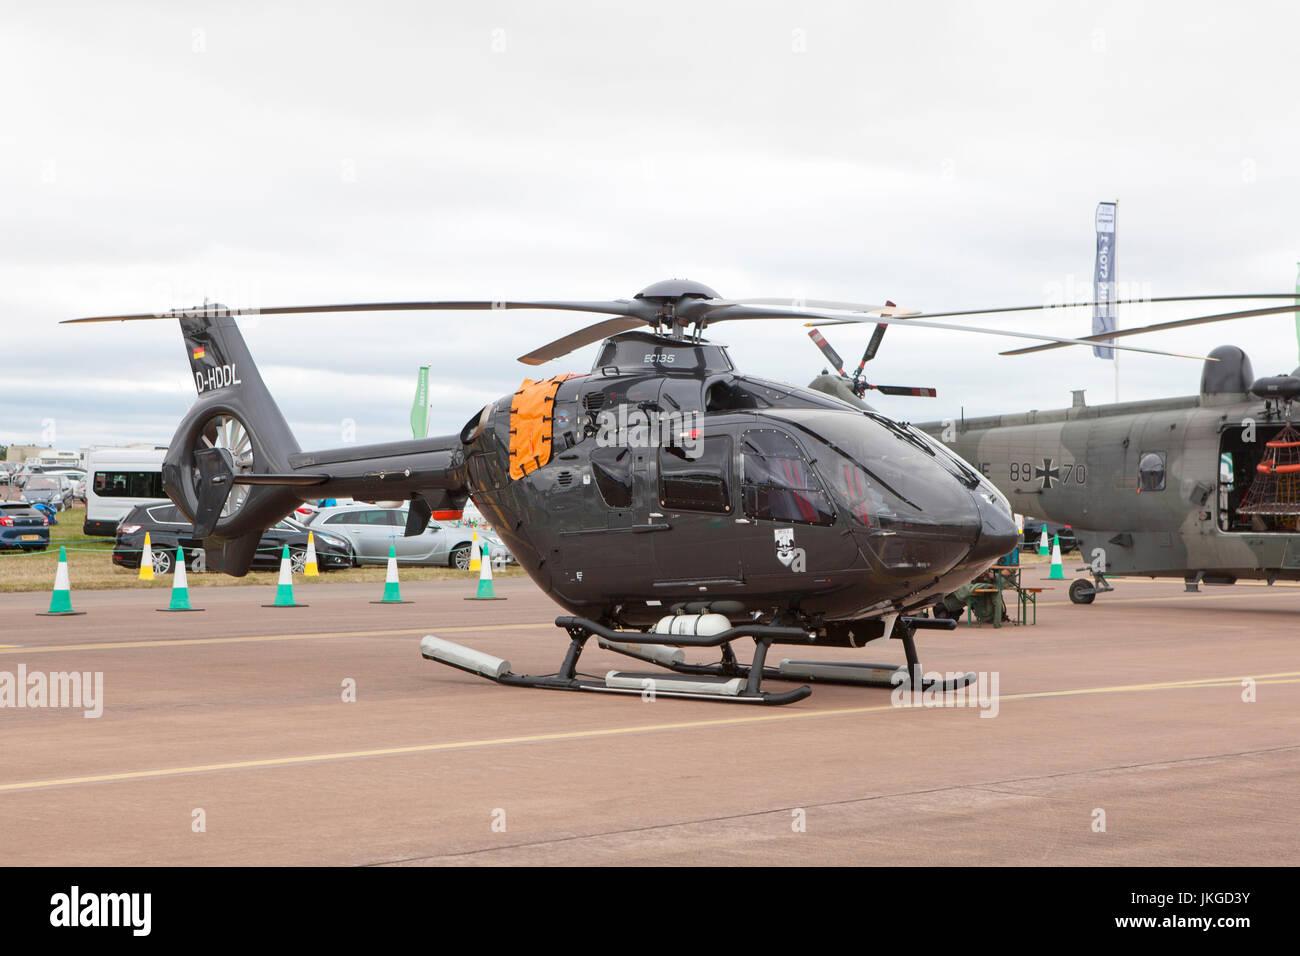 Elicottero Marina Militare : Marineflieger marina militare tedesca dl airbus elicottero